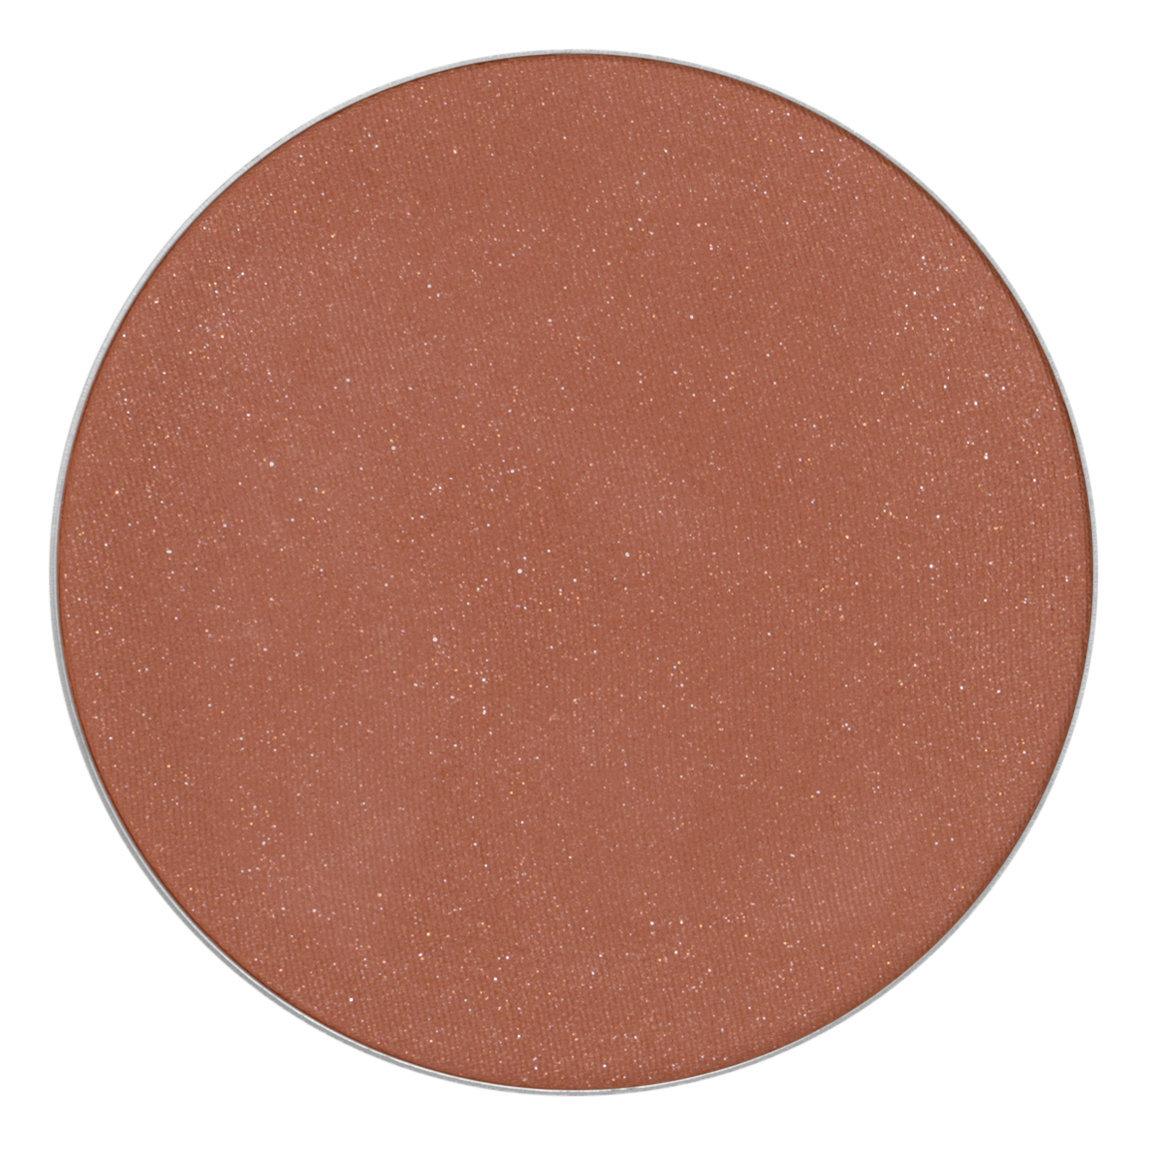 Inglot Cosmetics Freedom System AMC Bronzing Powder Round 72 product swatch.